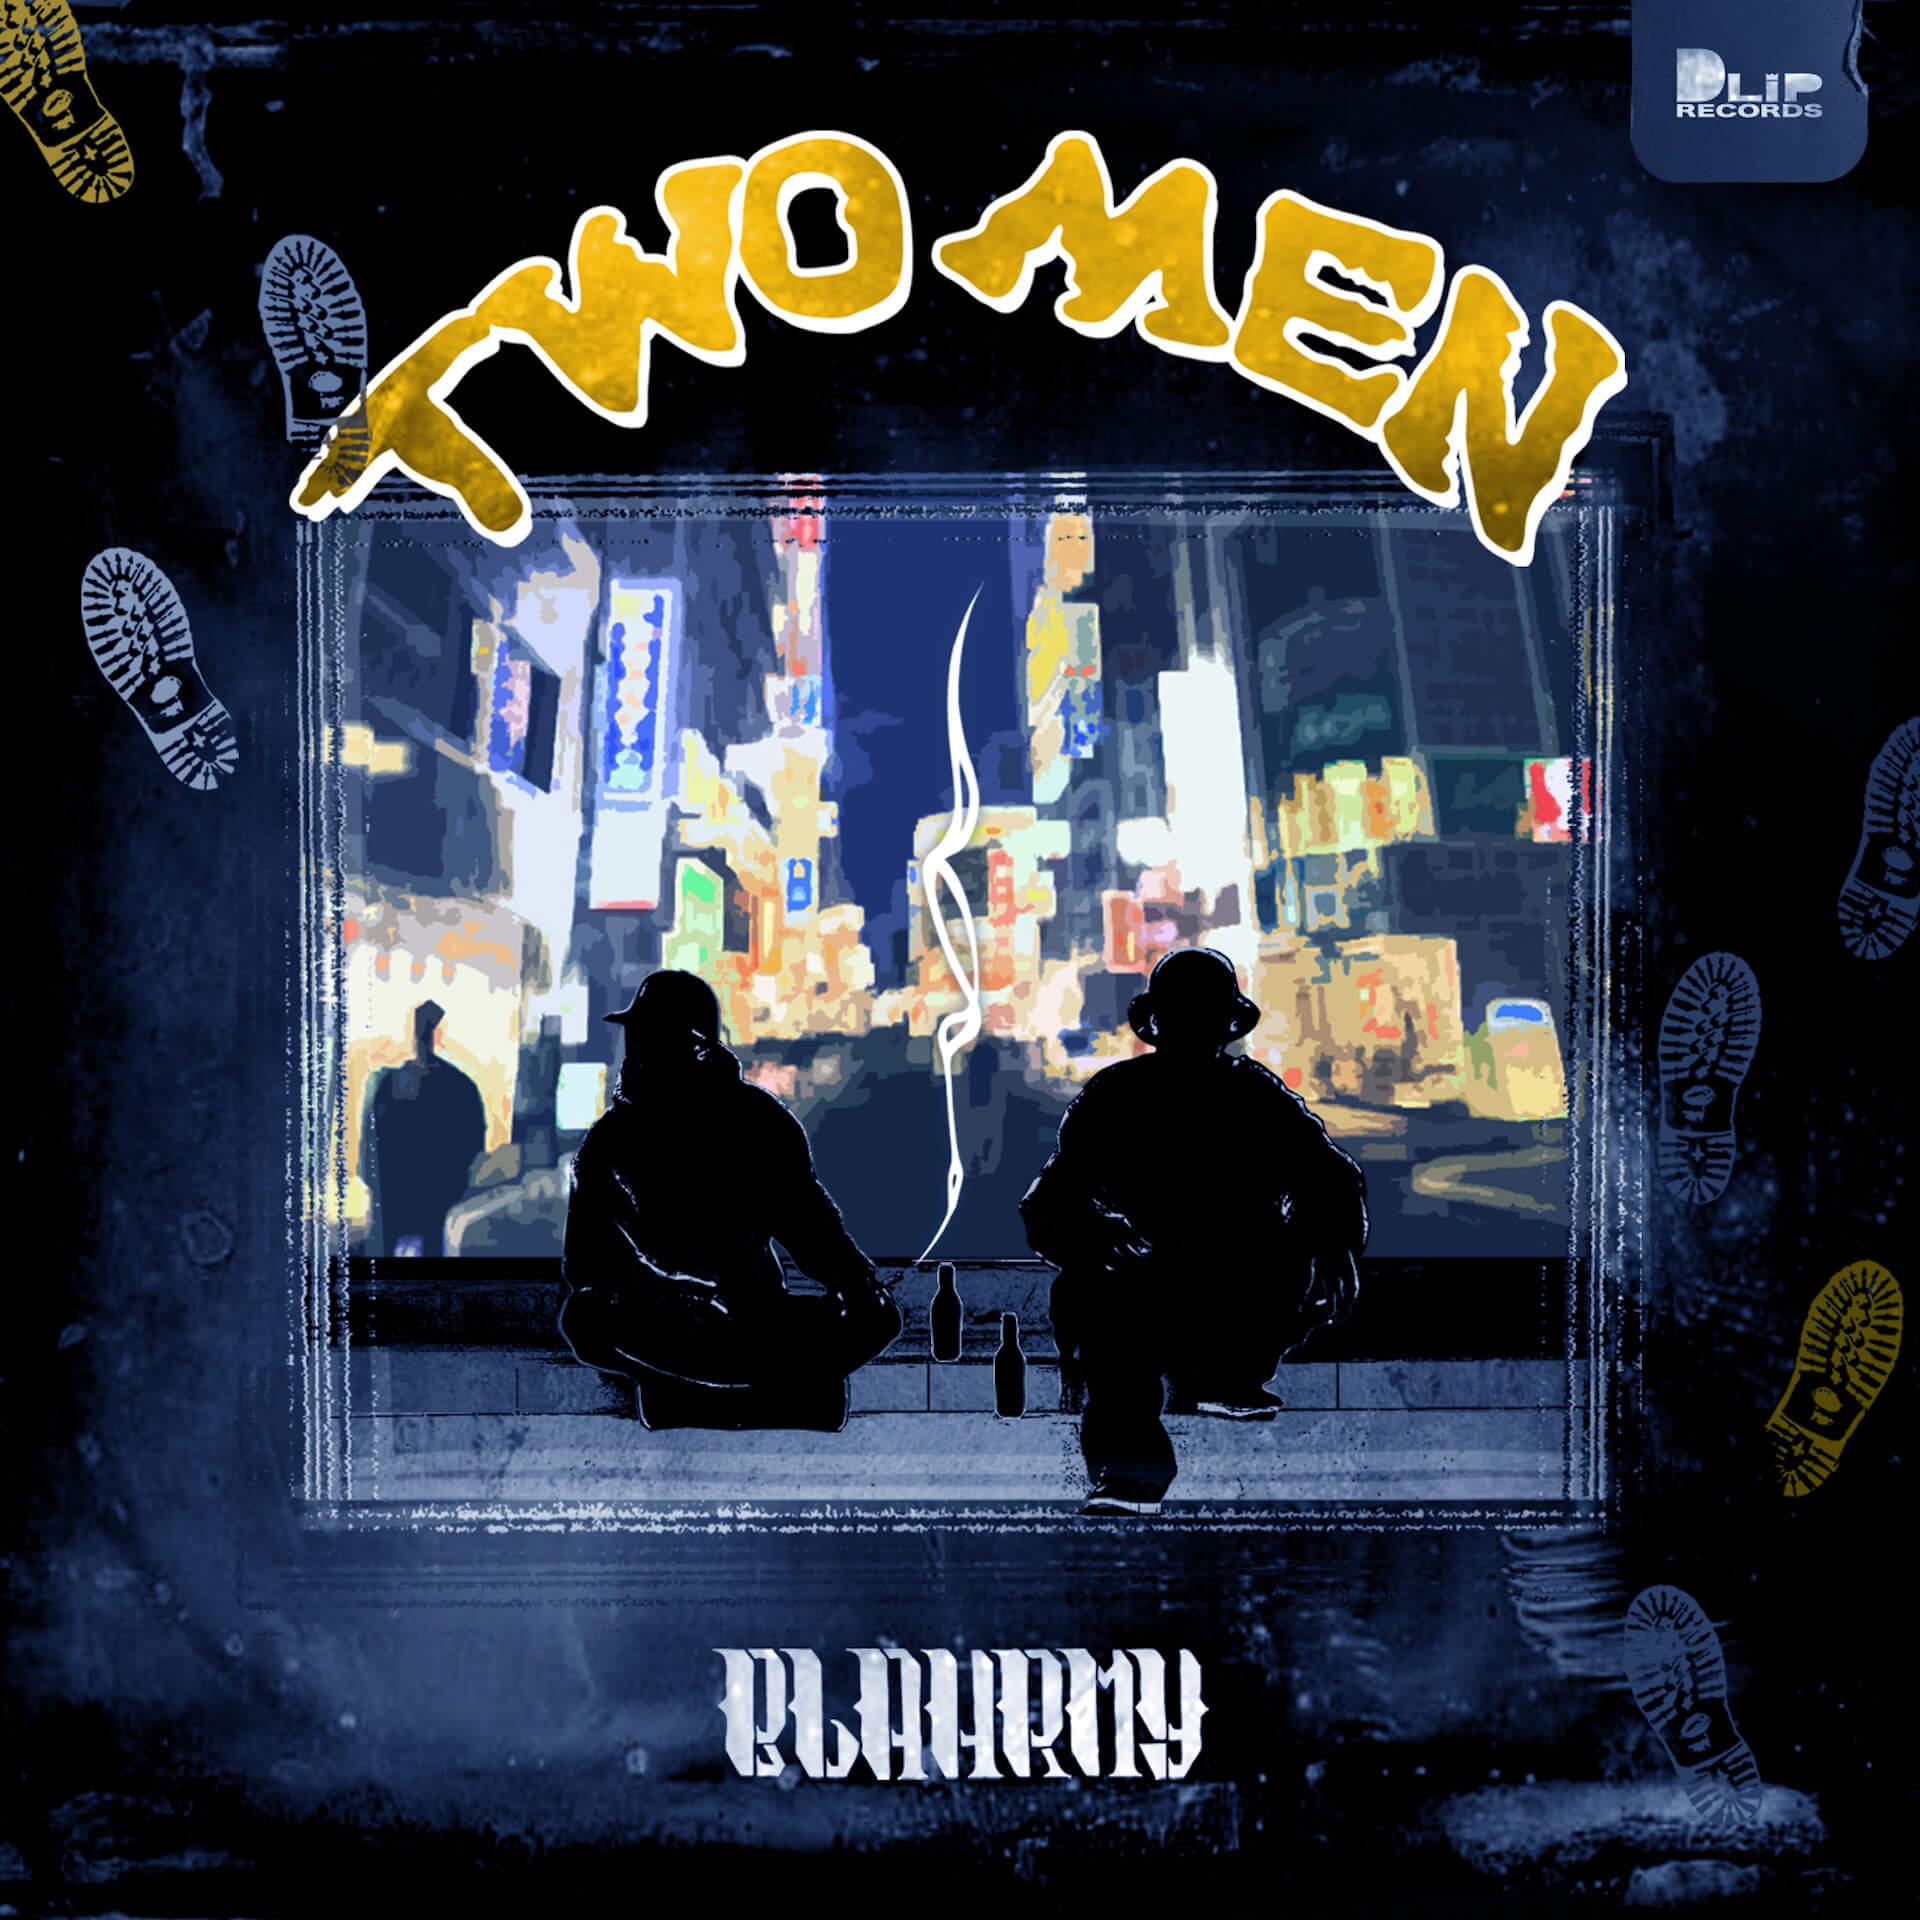 MILES WORDとSHEEF THE 3RDによるBLAHRMYが9年ぶりの2ndアルバム『TWO MEN』のリリースを発表! music210601_blahrmy_2